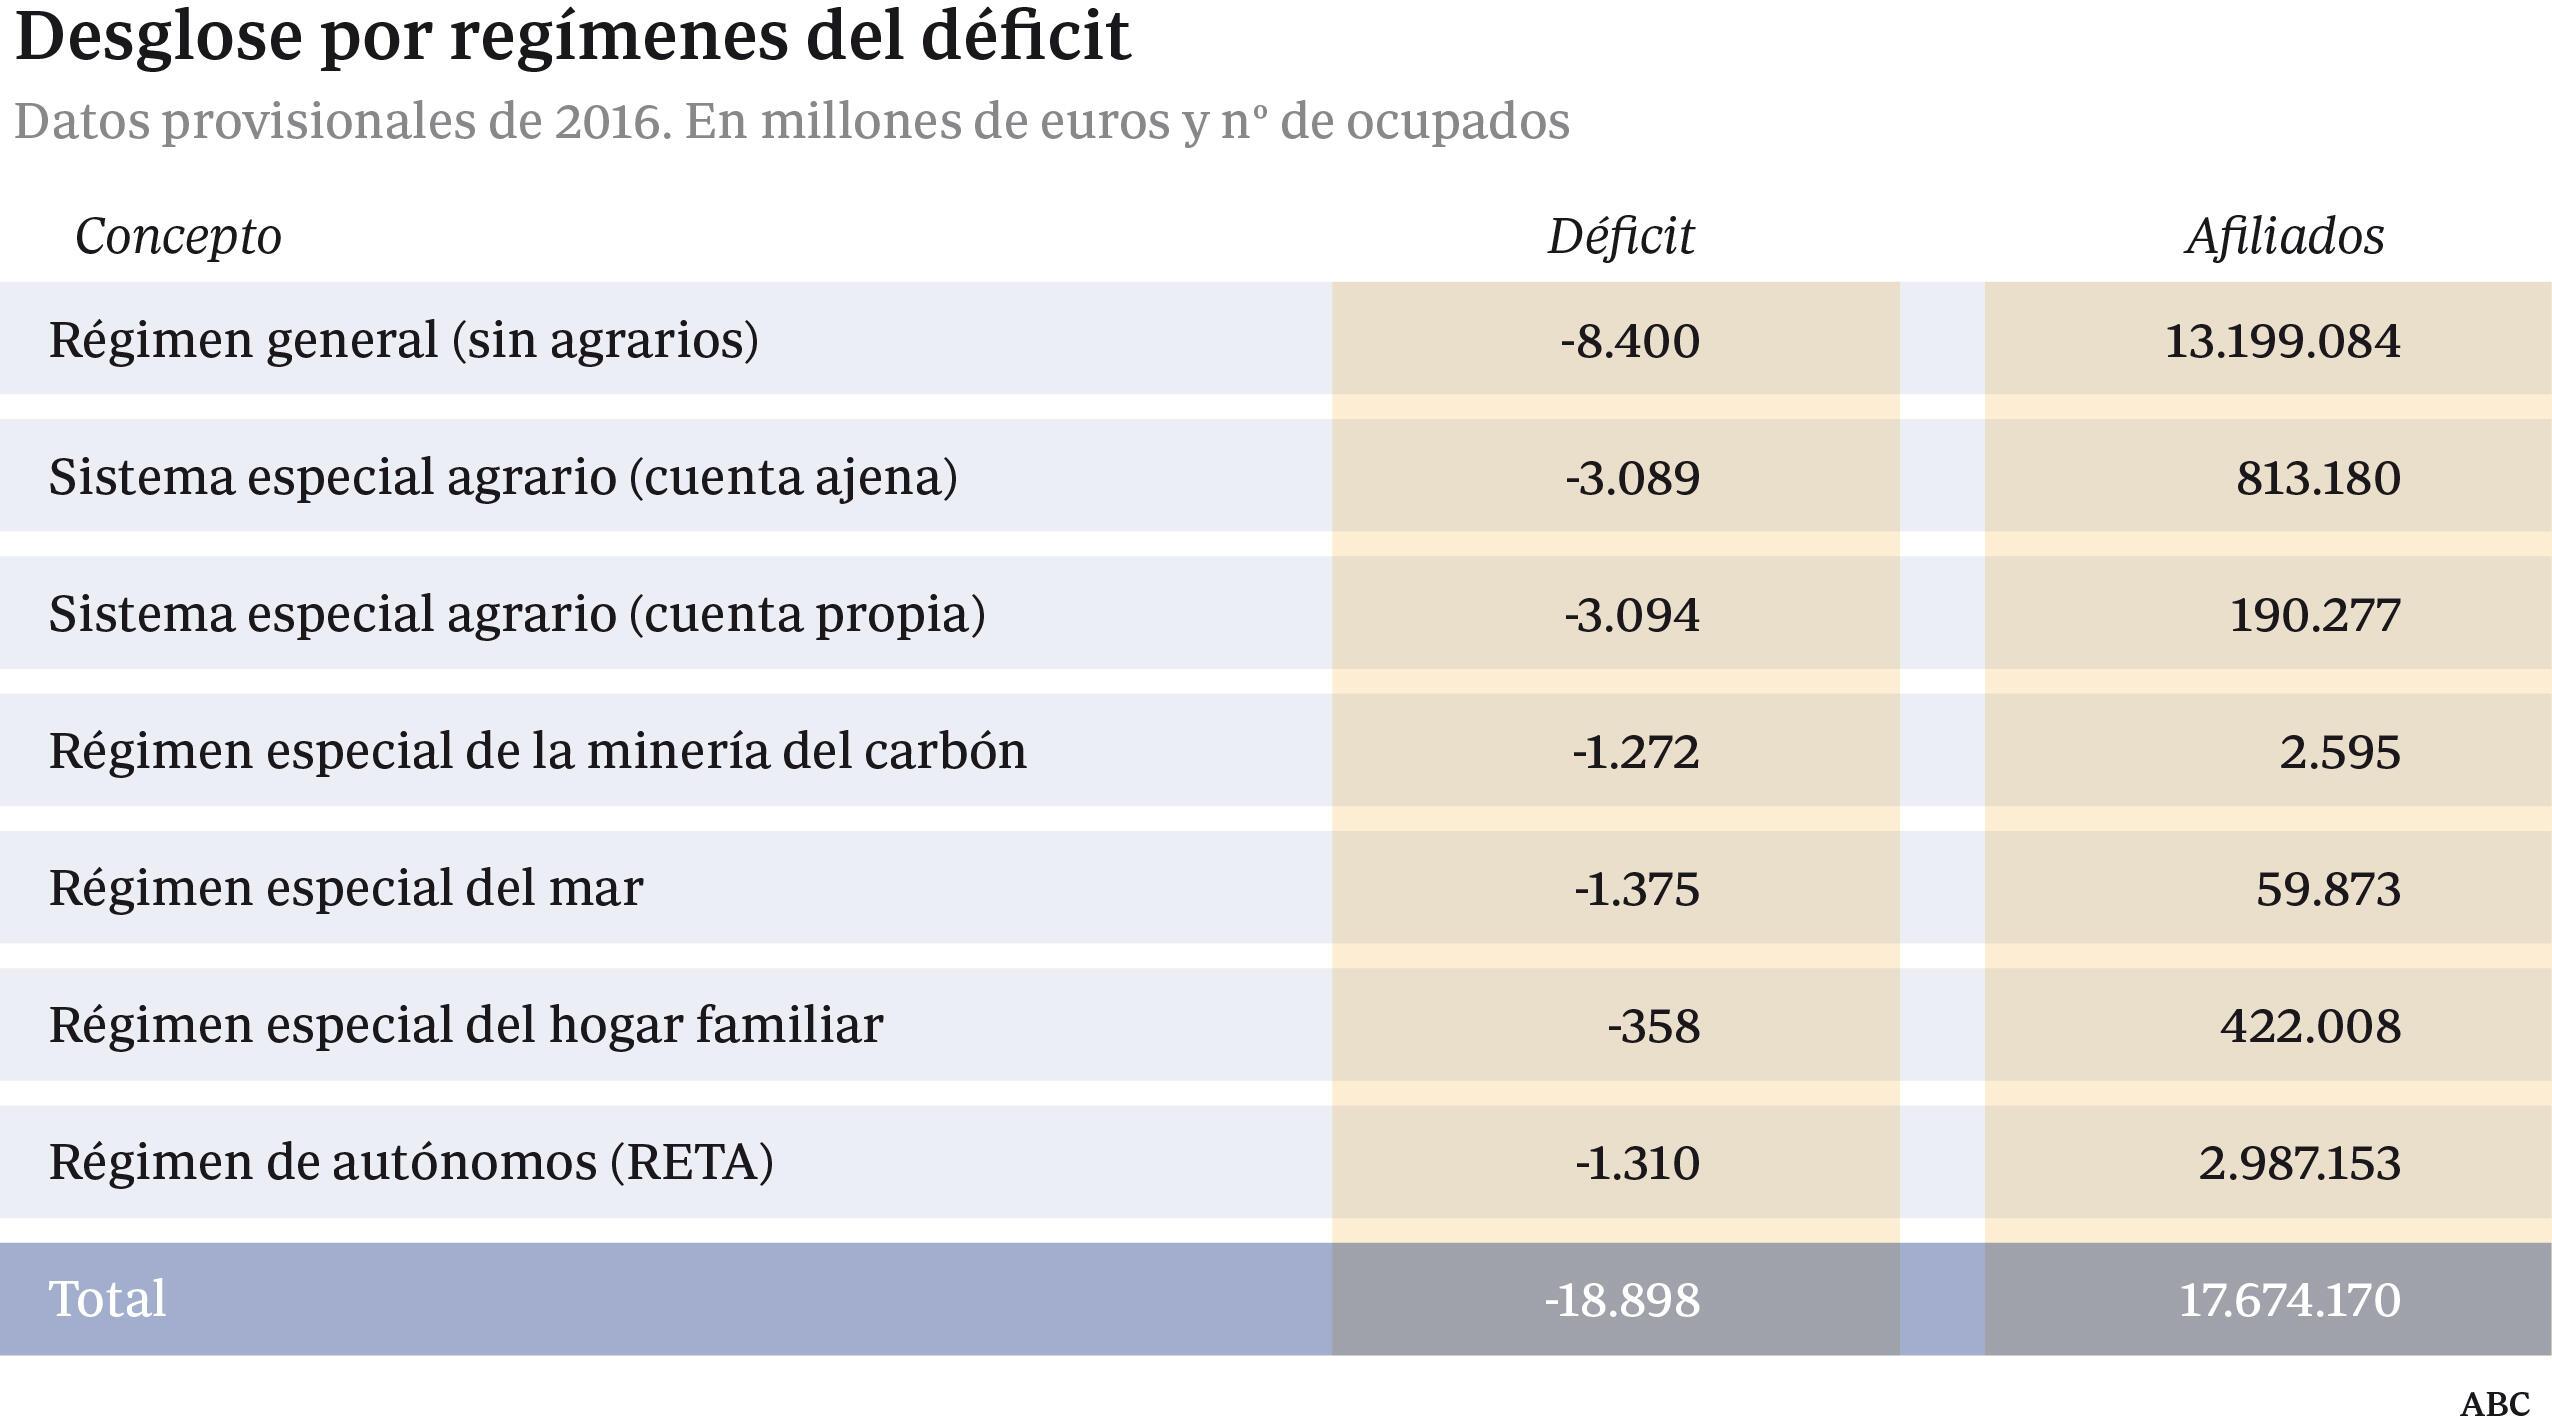 Bmn debe dotar 700 millones m s ante su fusi n con bankia for Bmn clausula suelo 2016